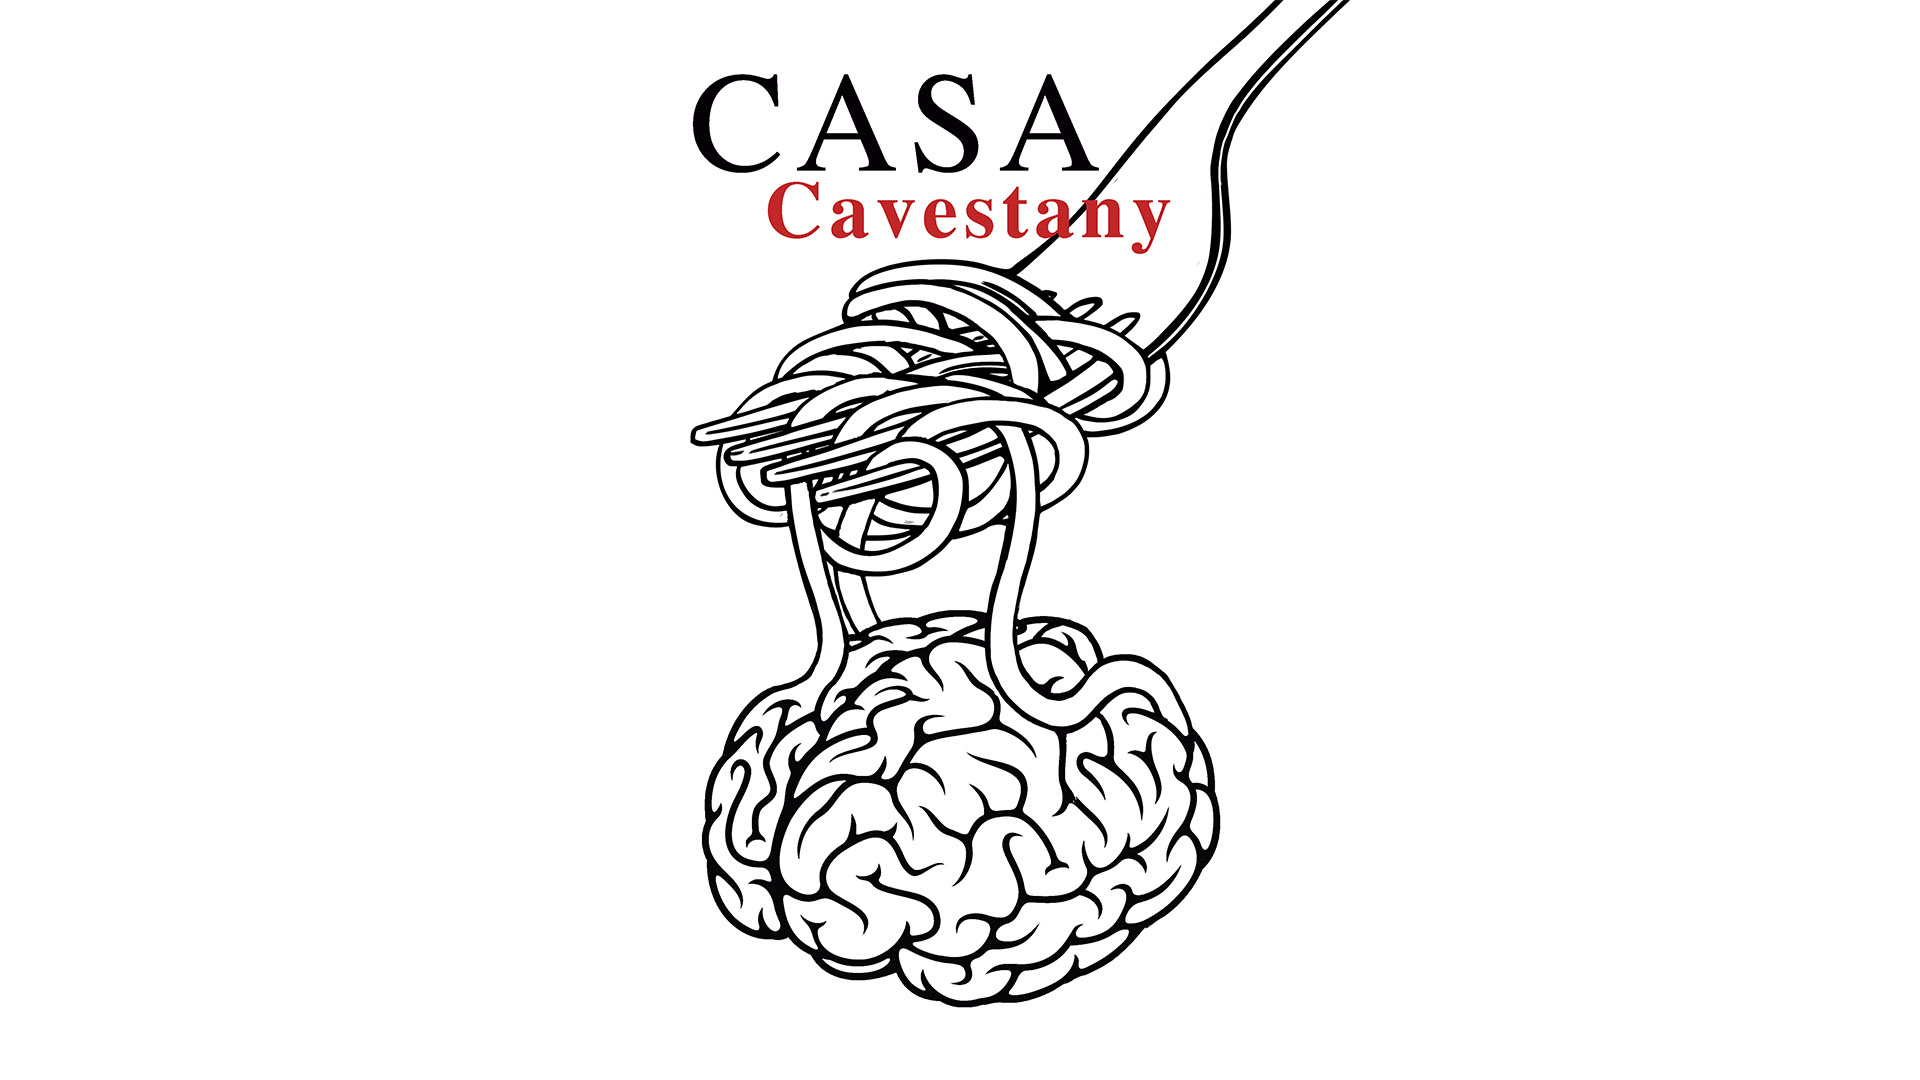 Casa Cavestany